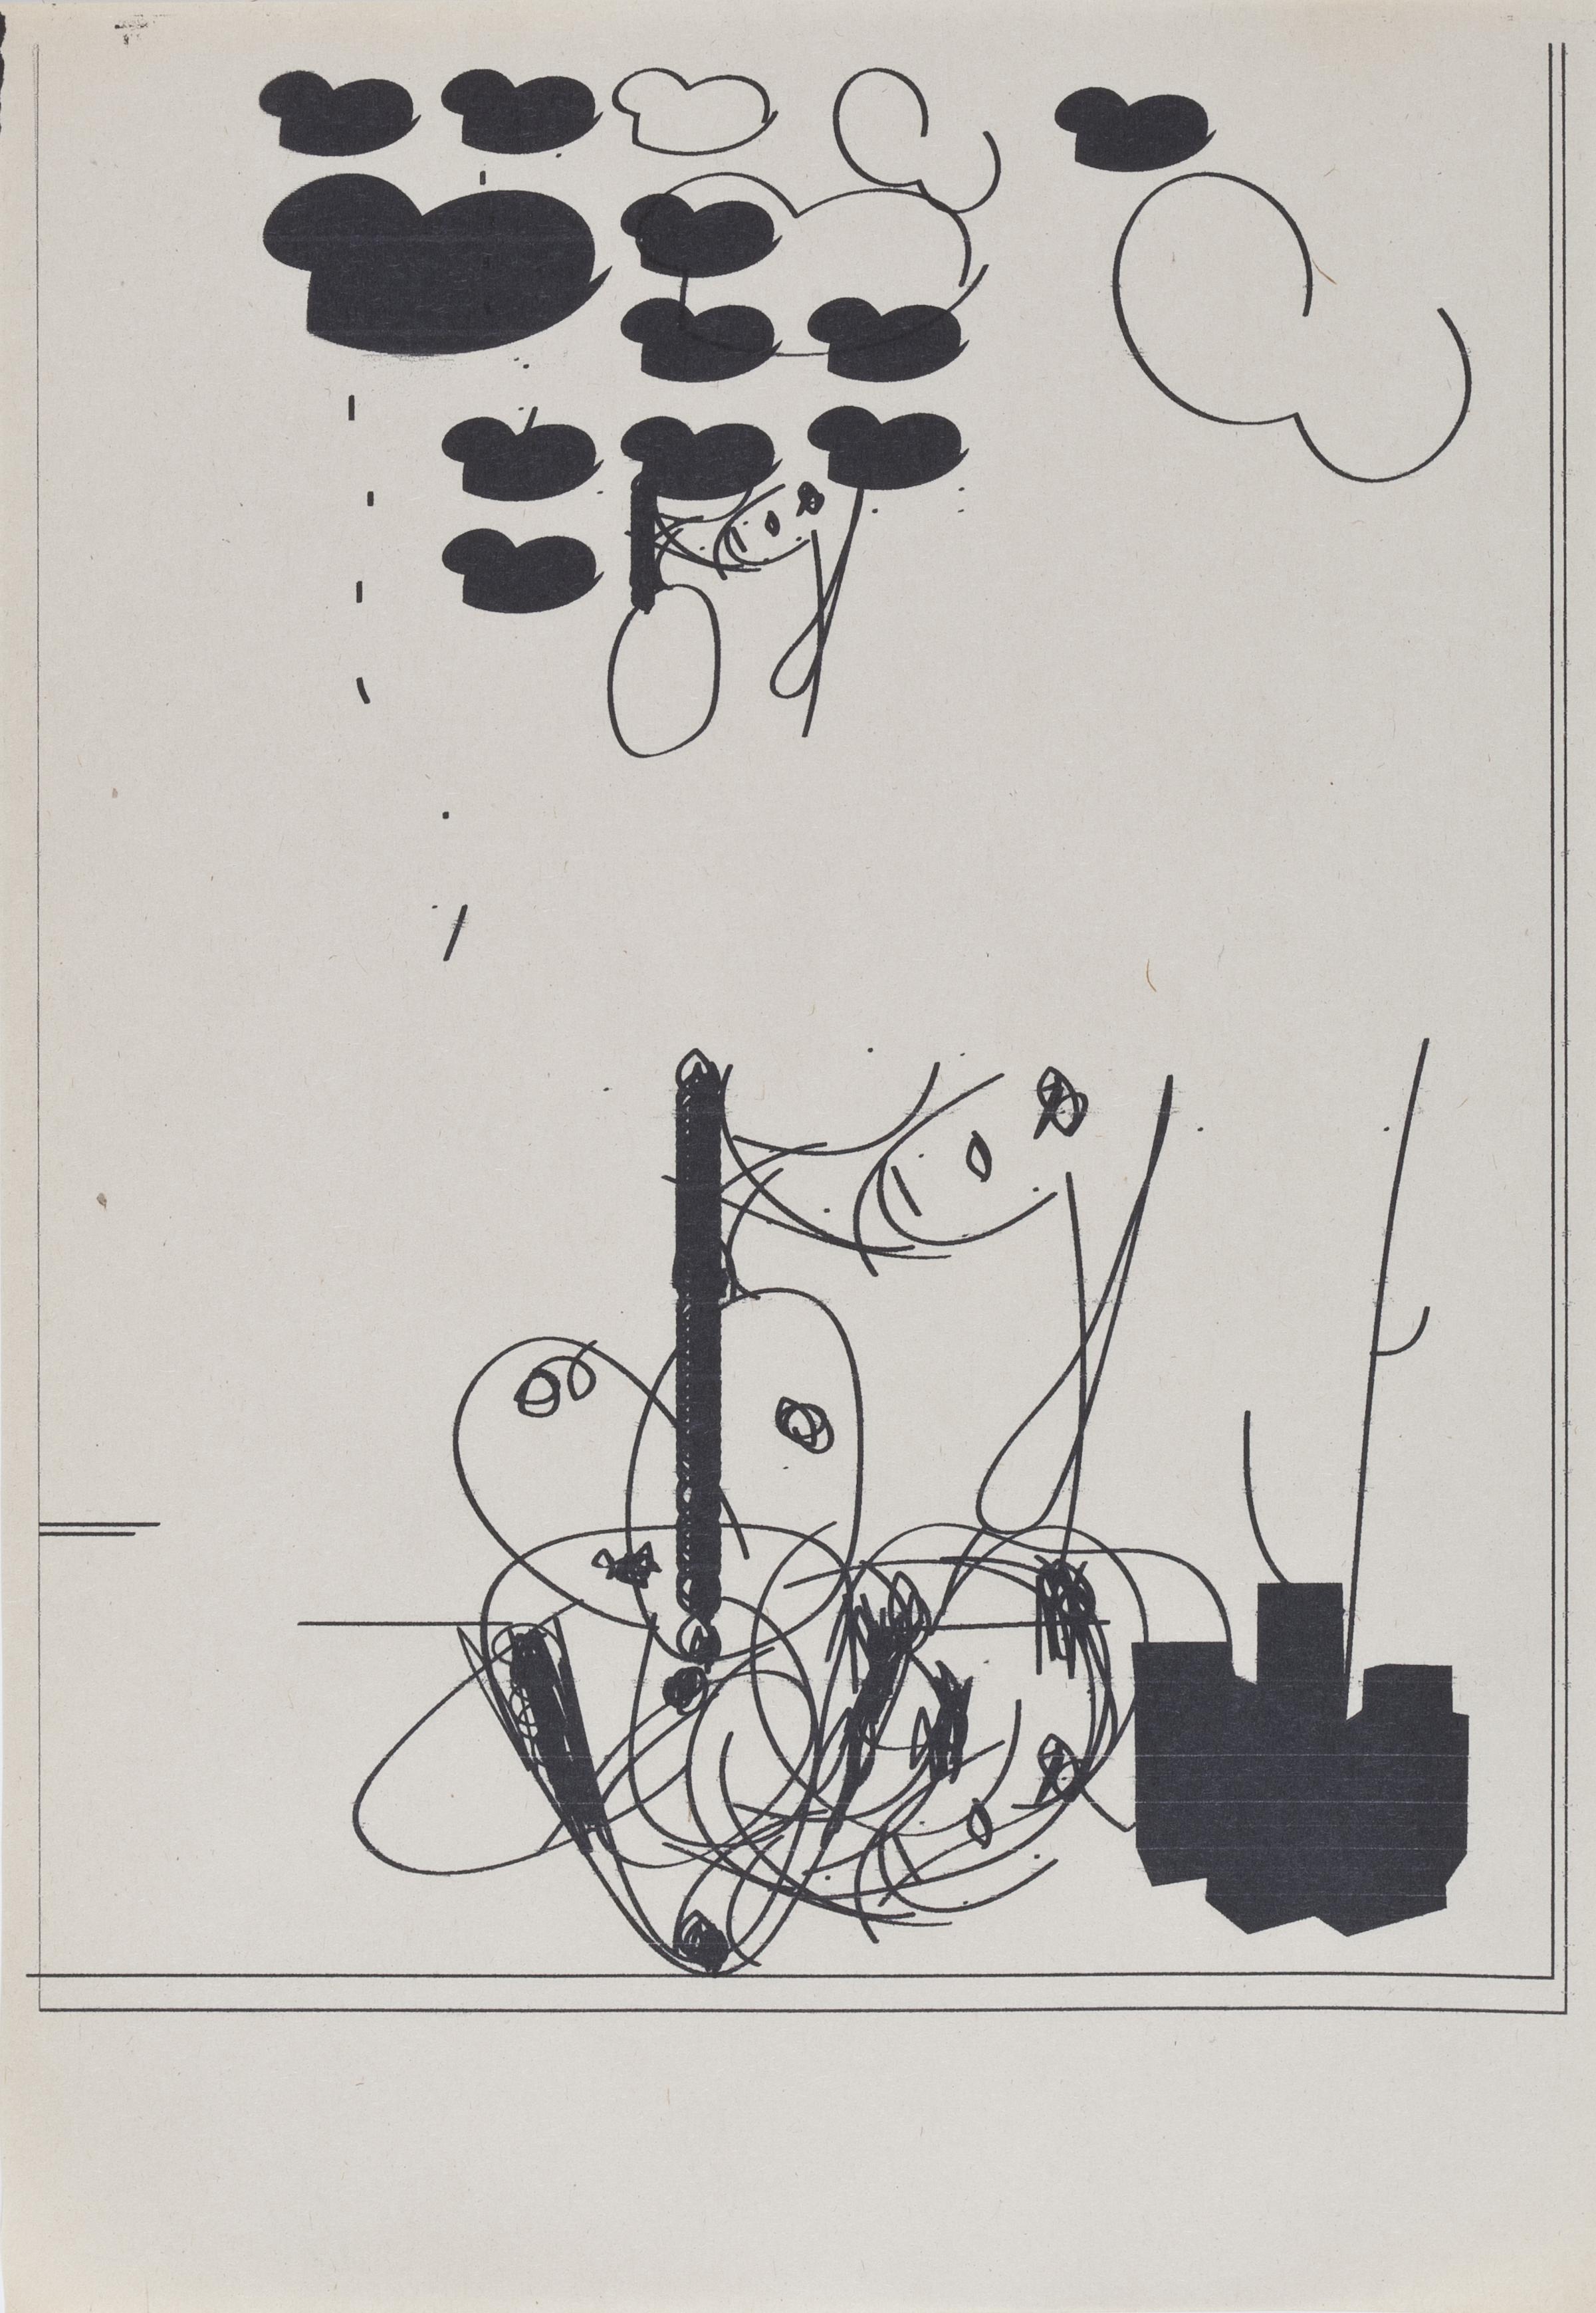 w30-drawing-244